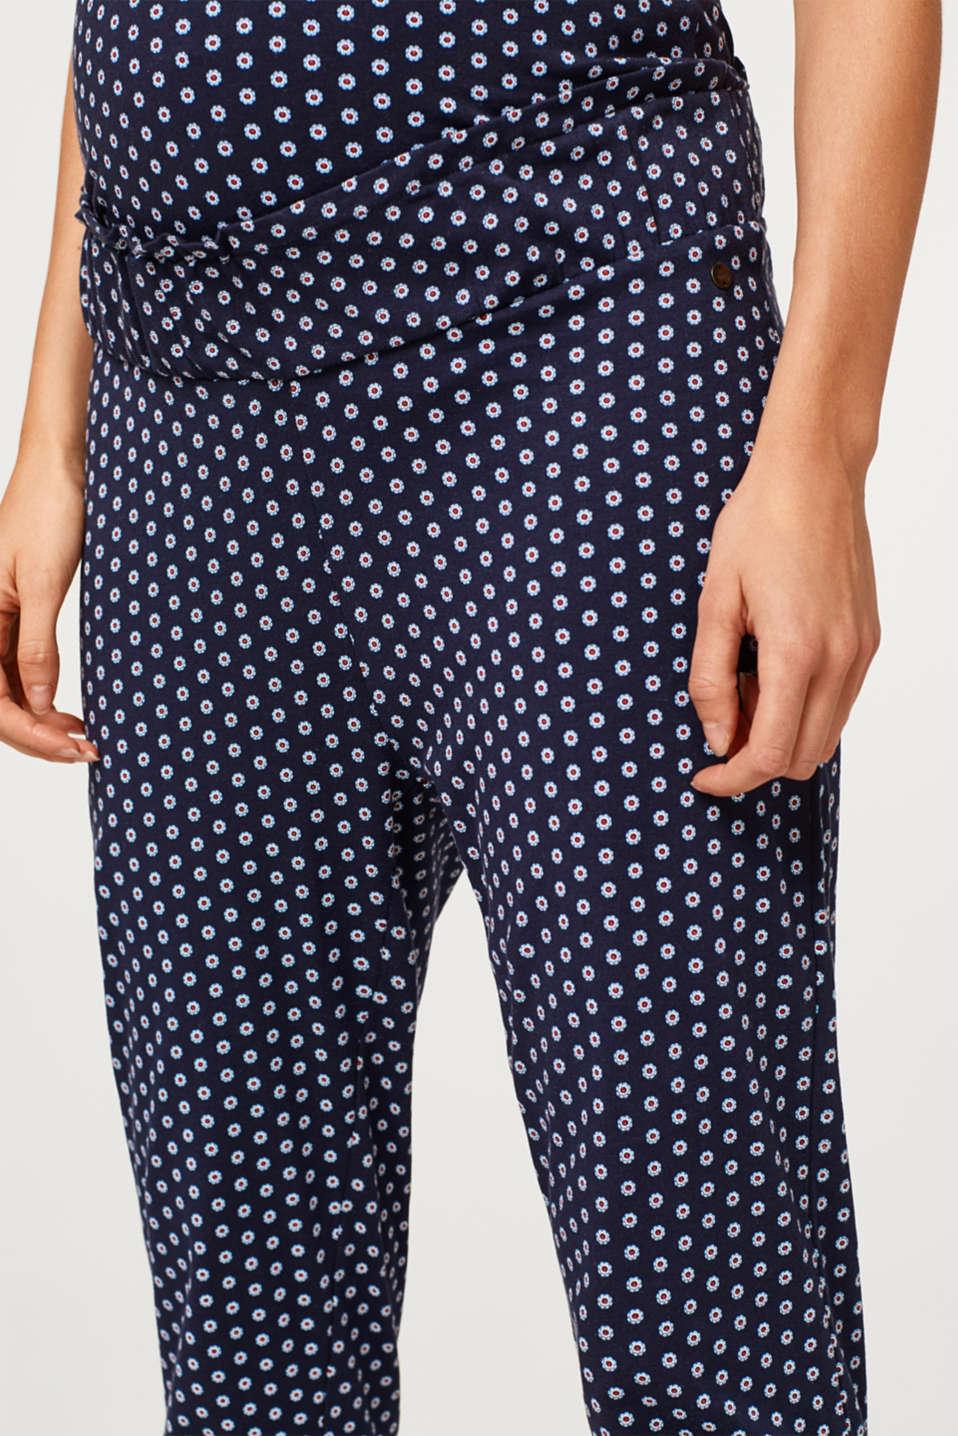 Nightpants, LCNIGHT BLUE, detail image number 4